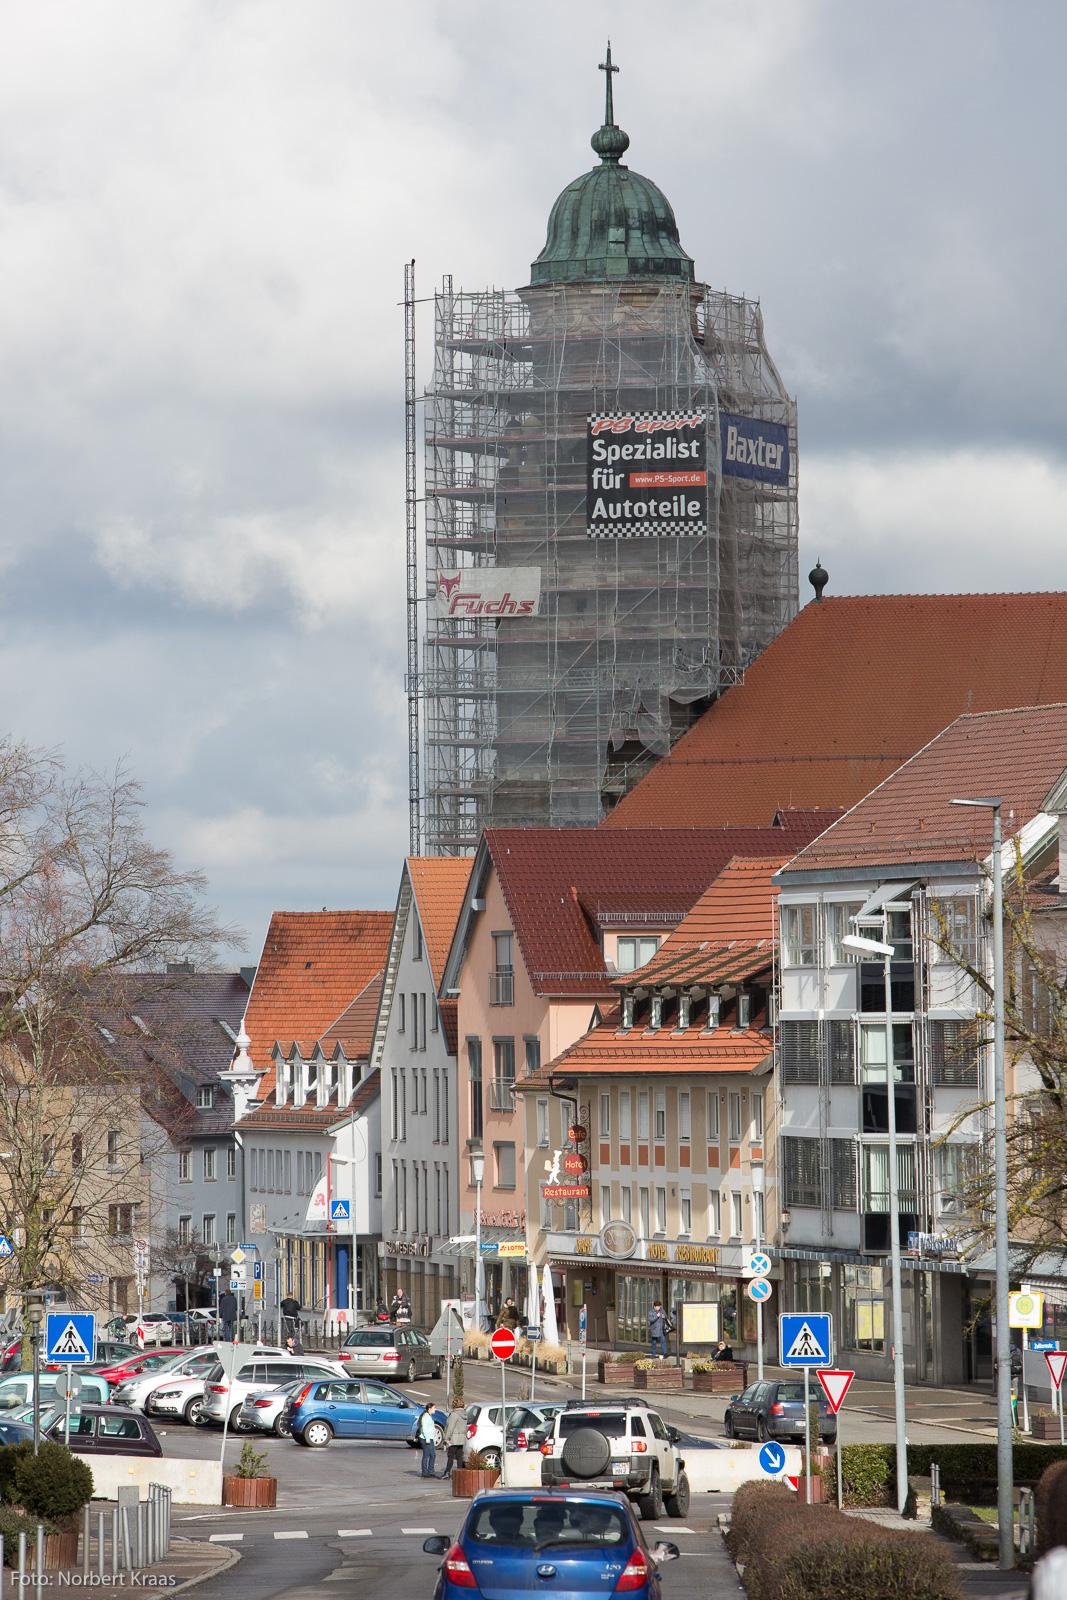 Katholische Stiftskirche St. Jakob in Hechingen